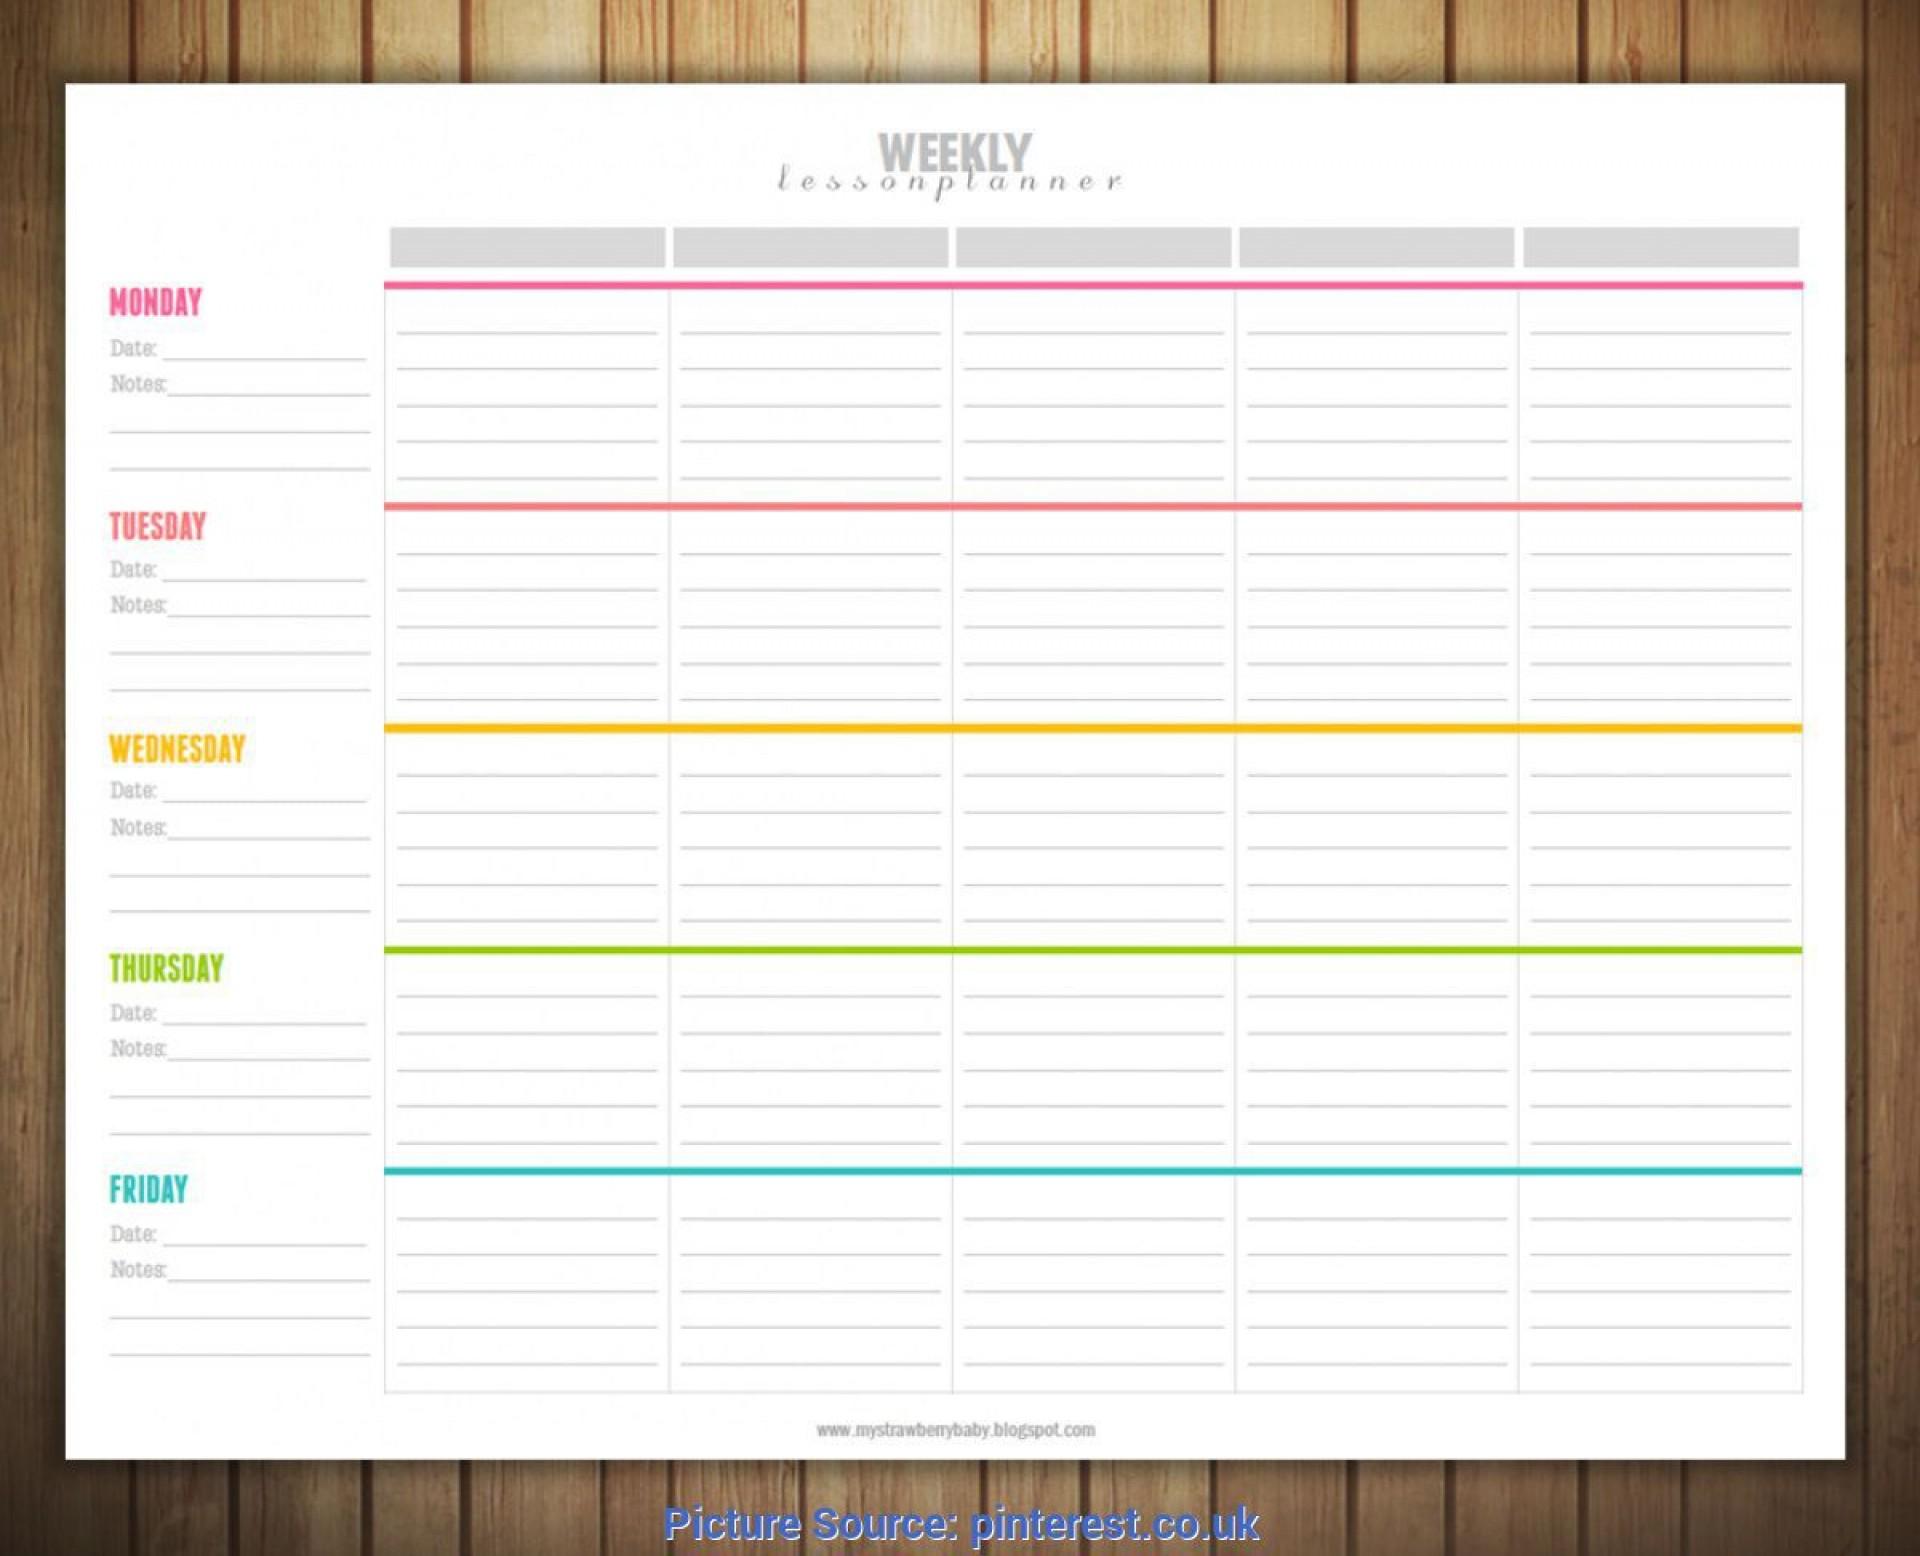 004 Singular Free Editable Weekly Lesson Plan Template Pdf High Resolution  Blank1920